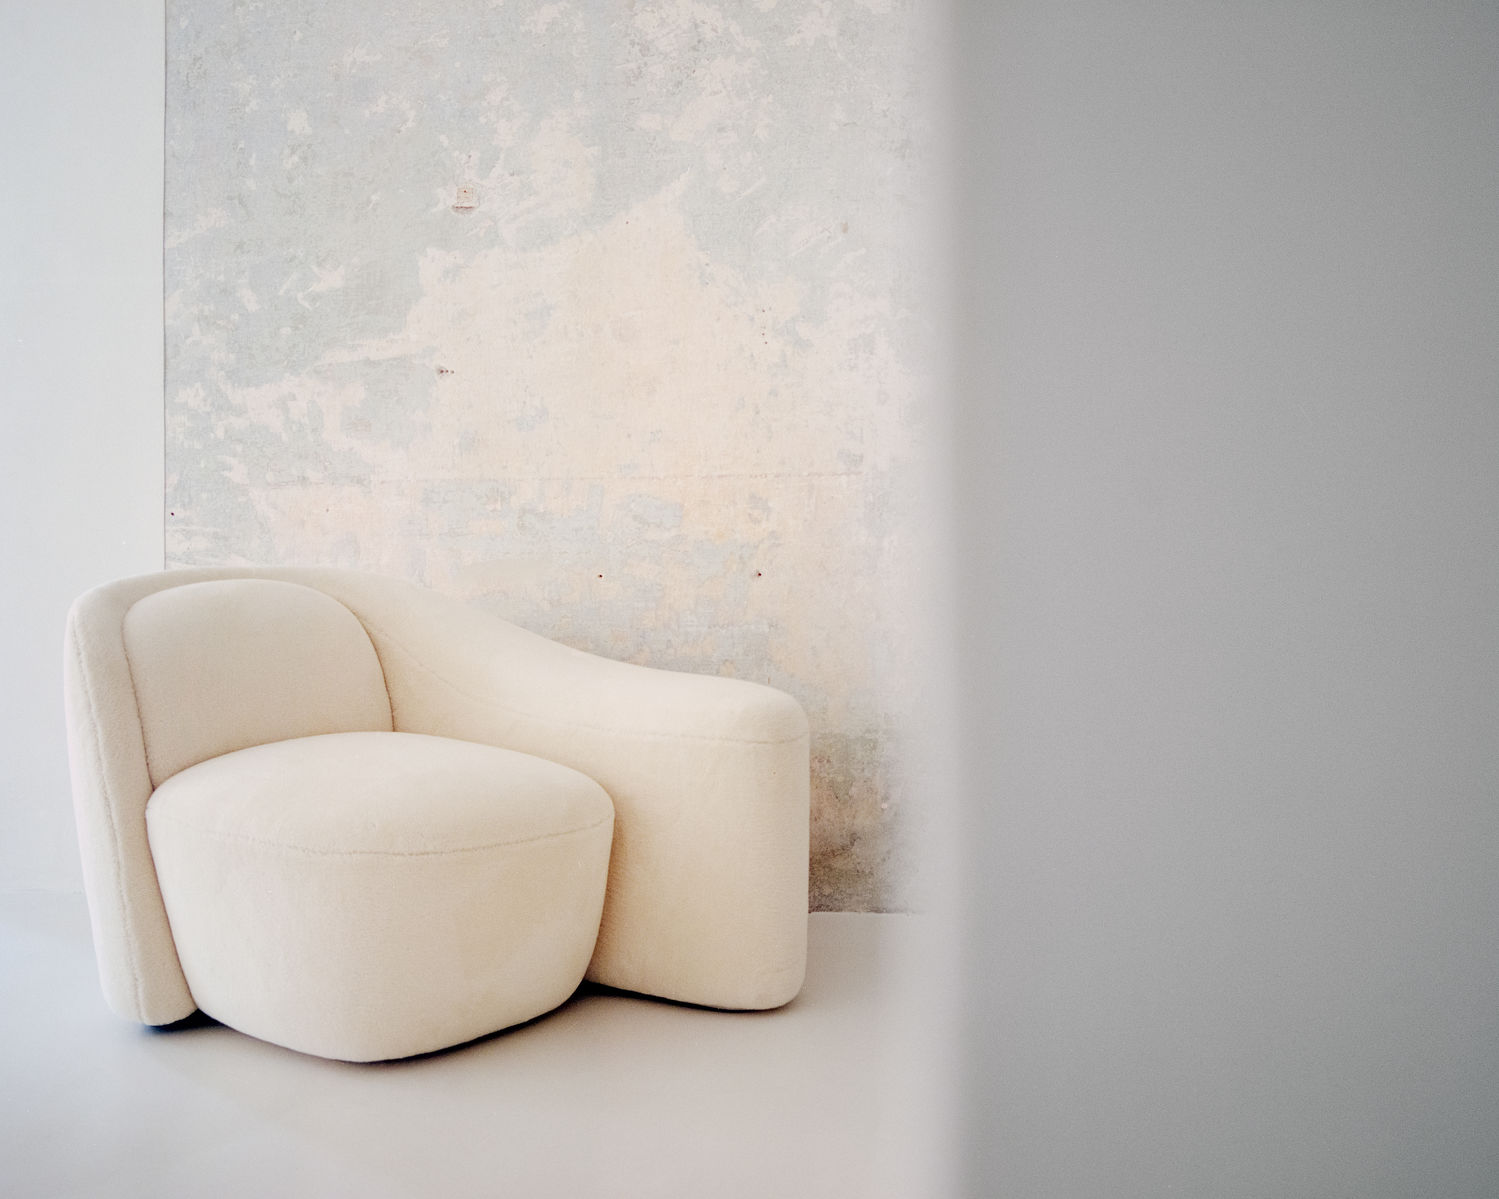 Palm Duet by Loro Piana Interiors - THE EDGE SINGAPORE